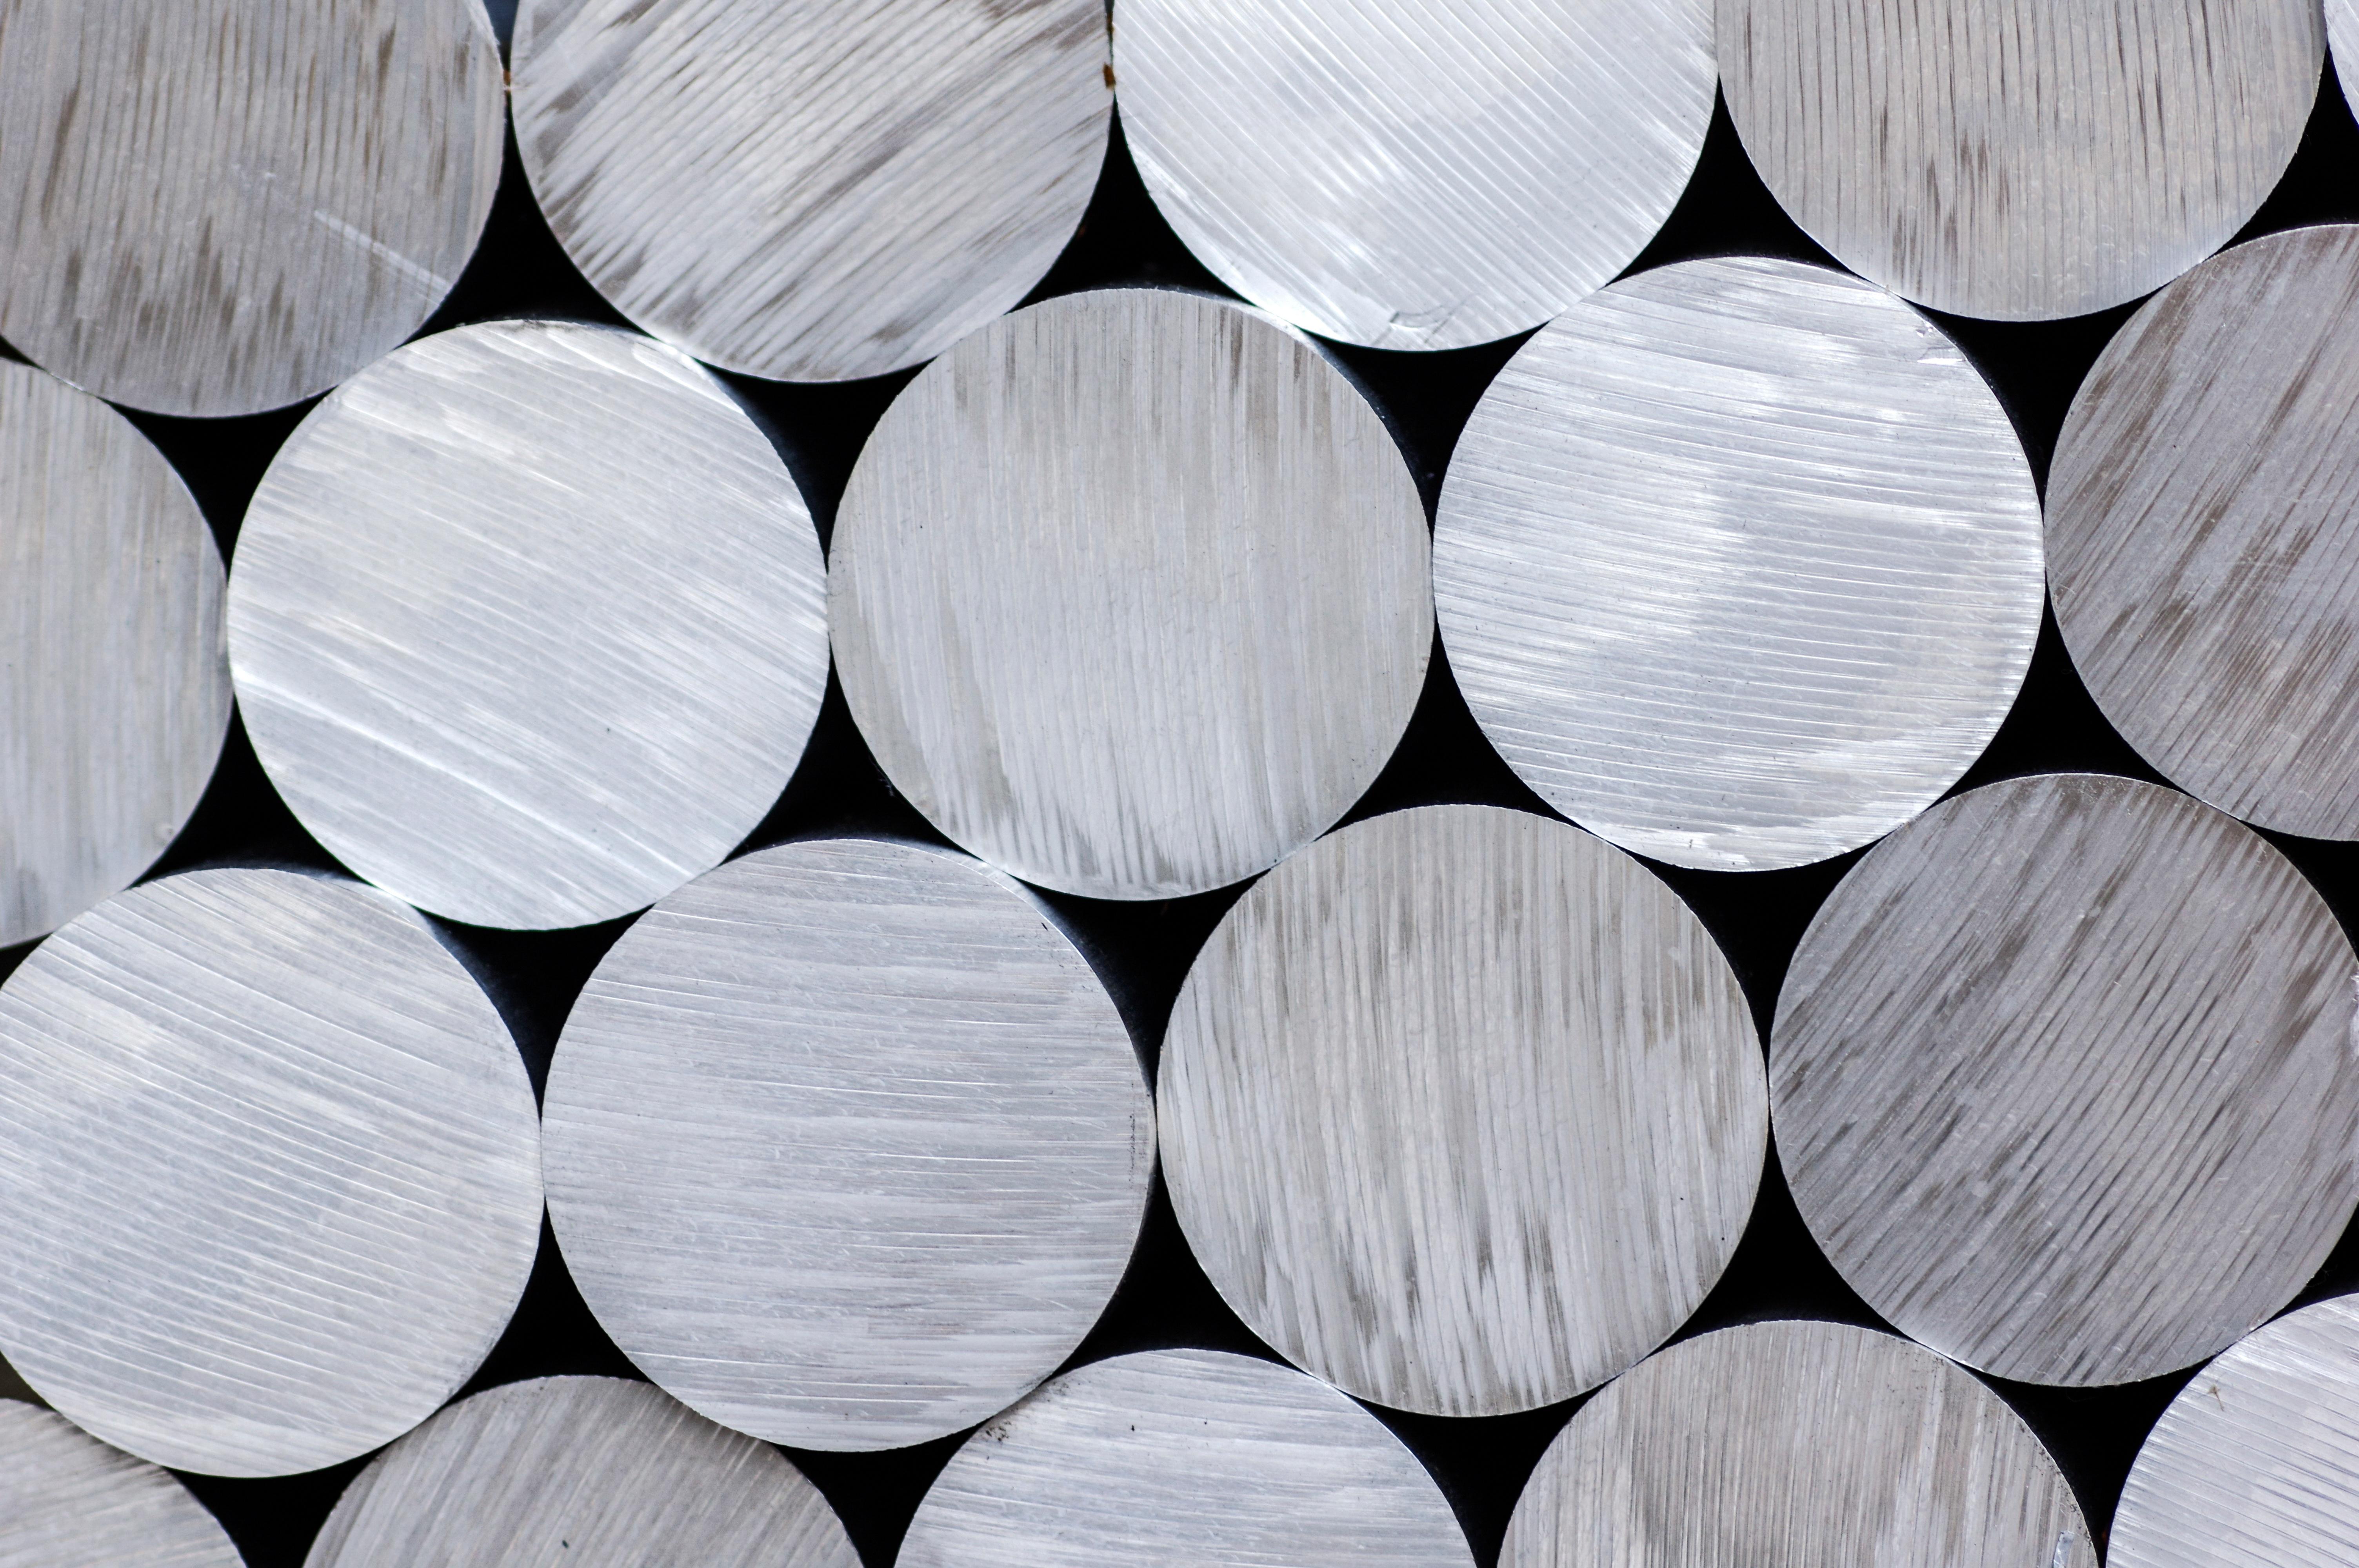 iStock-484252080 Steel Bars 4.jpg